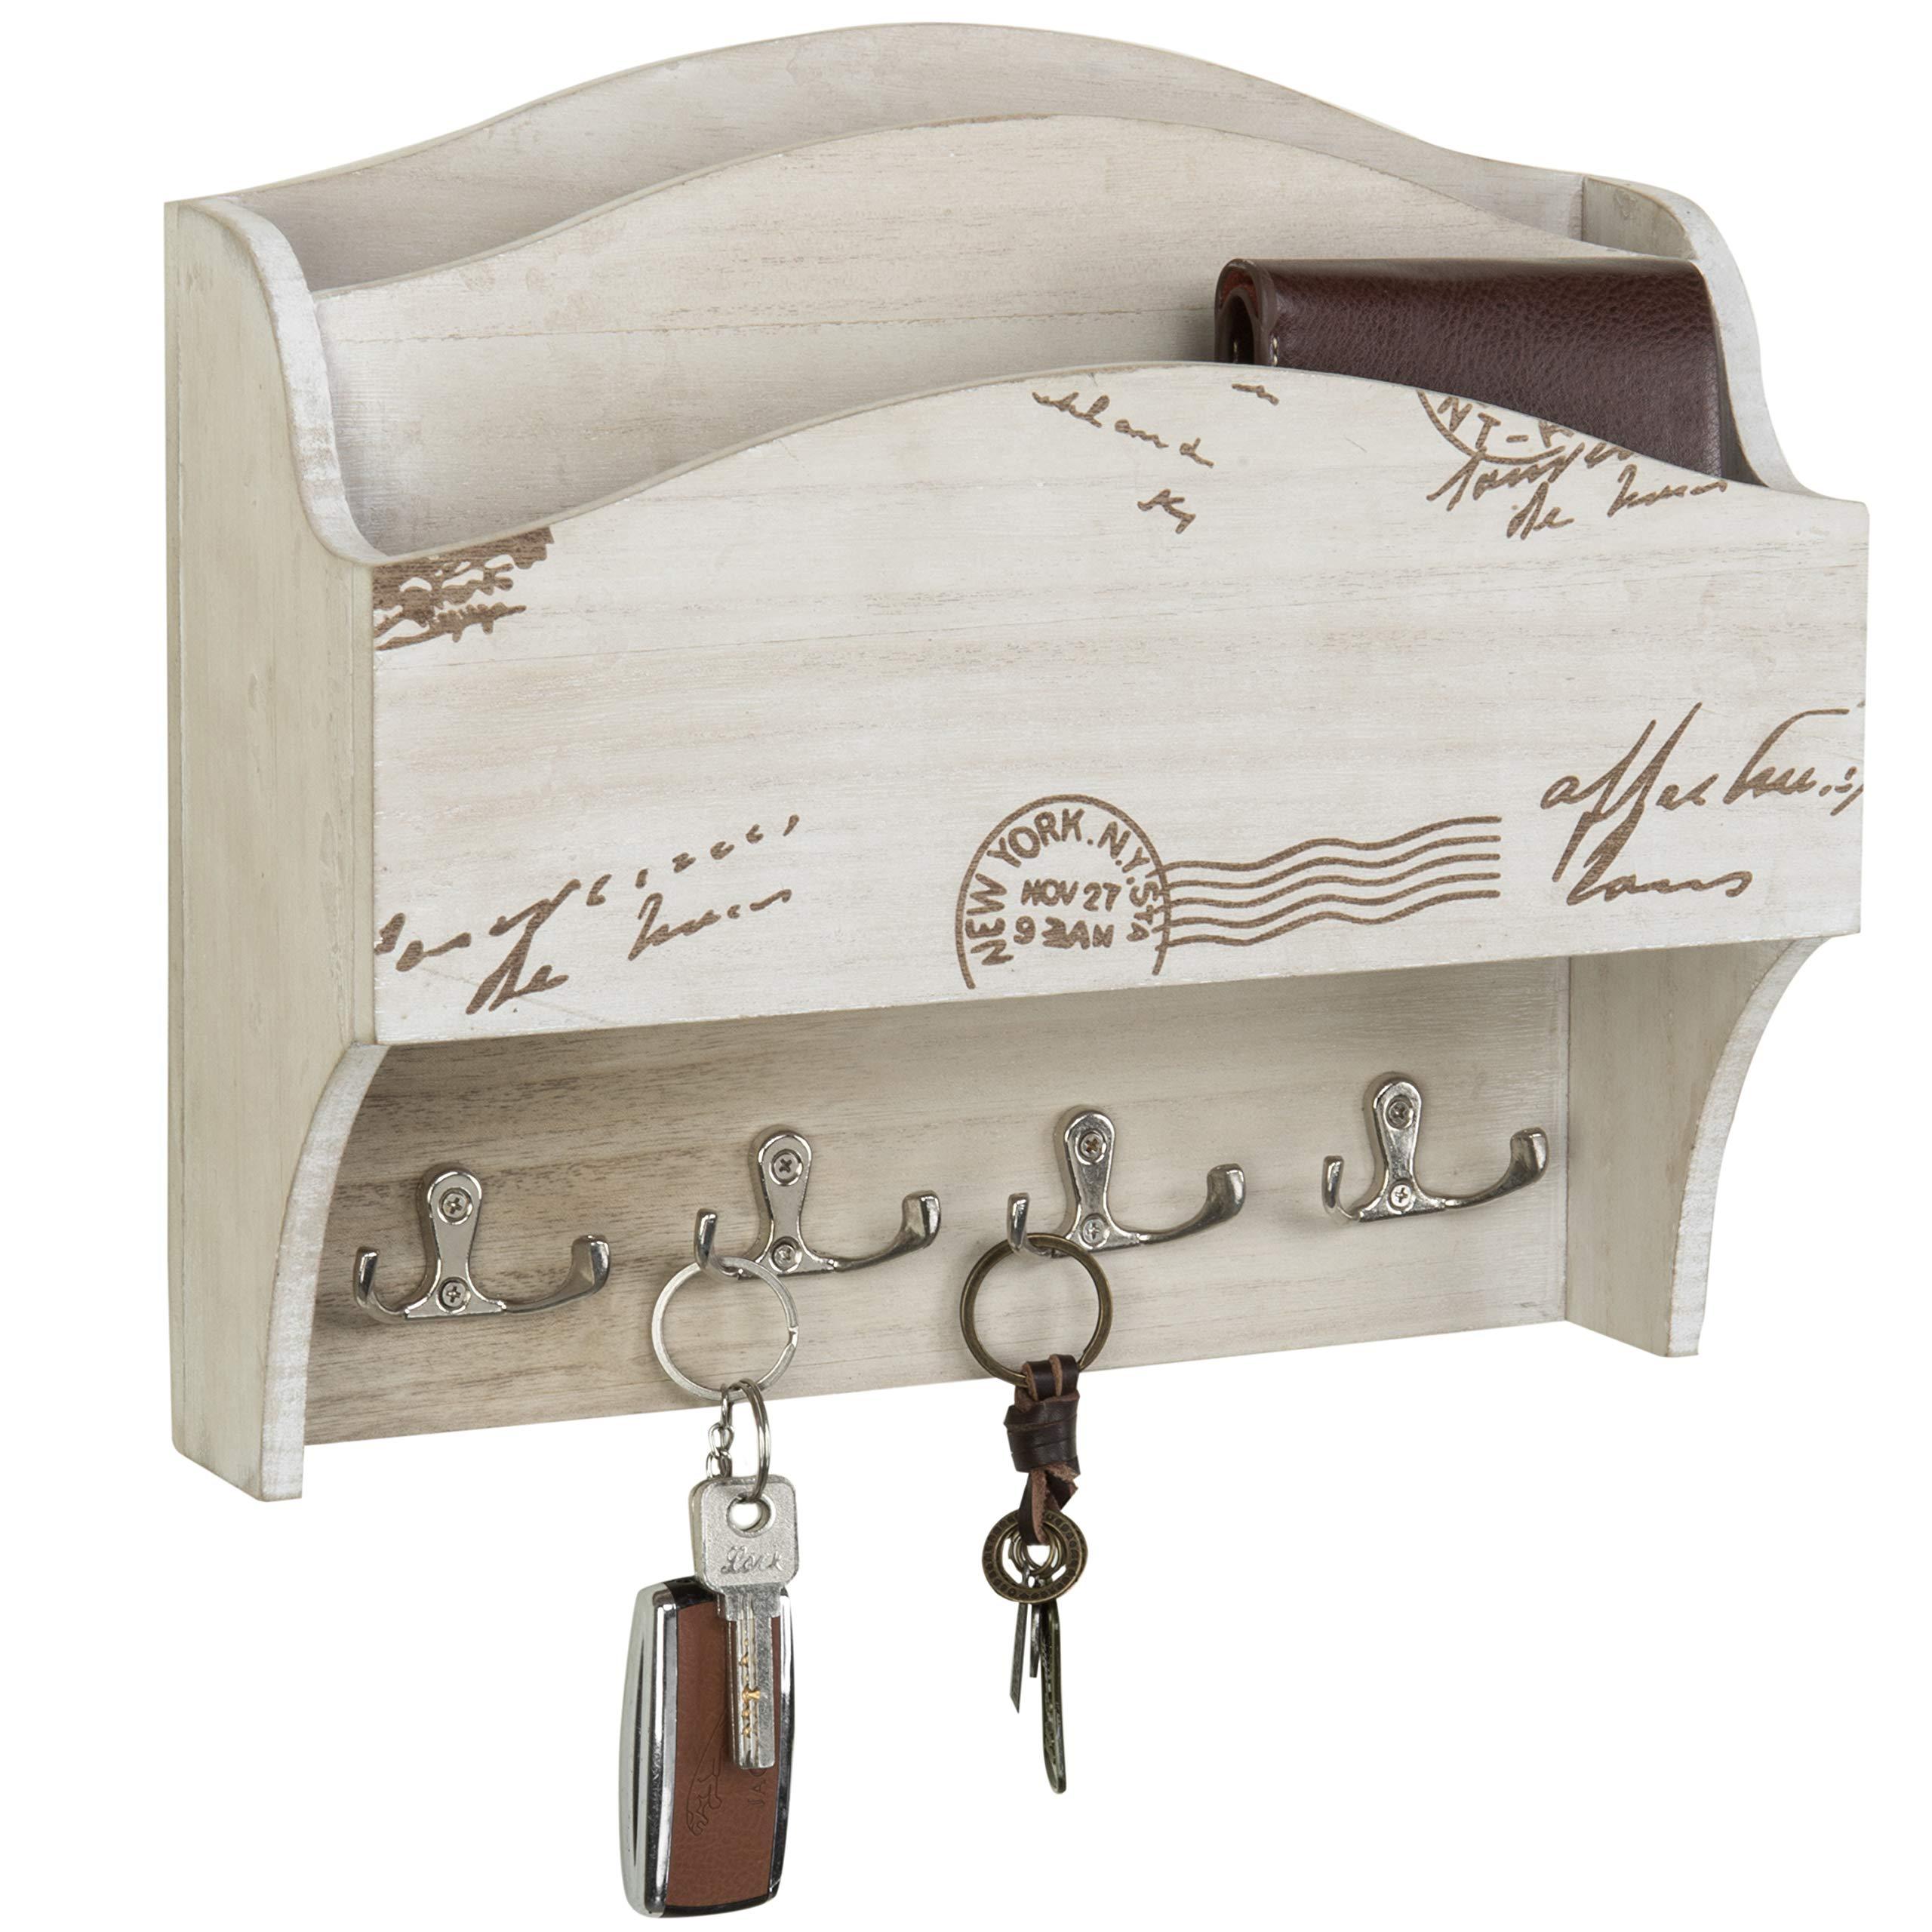 MyGift 2-Pocket Vintage White Wall-Mounted Mail Sorter & Key Hooks by MyGift